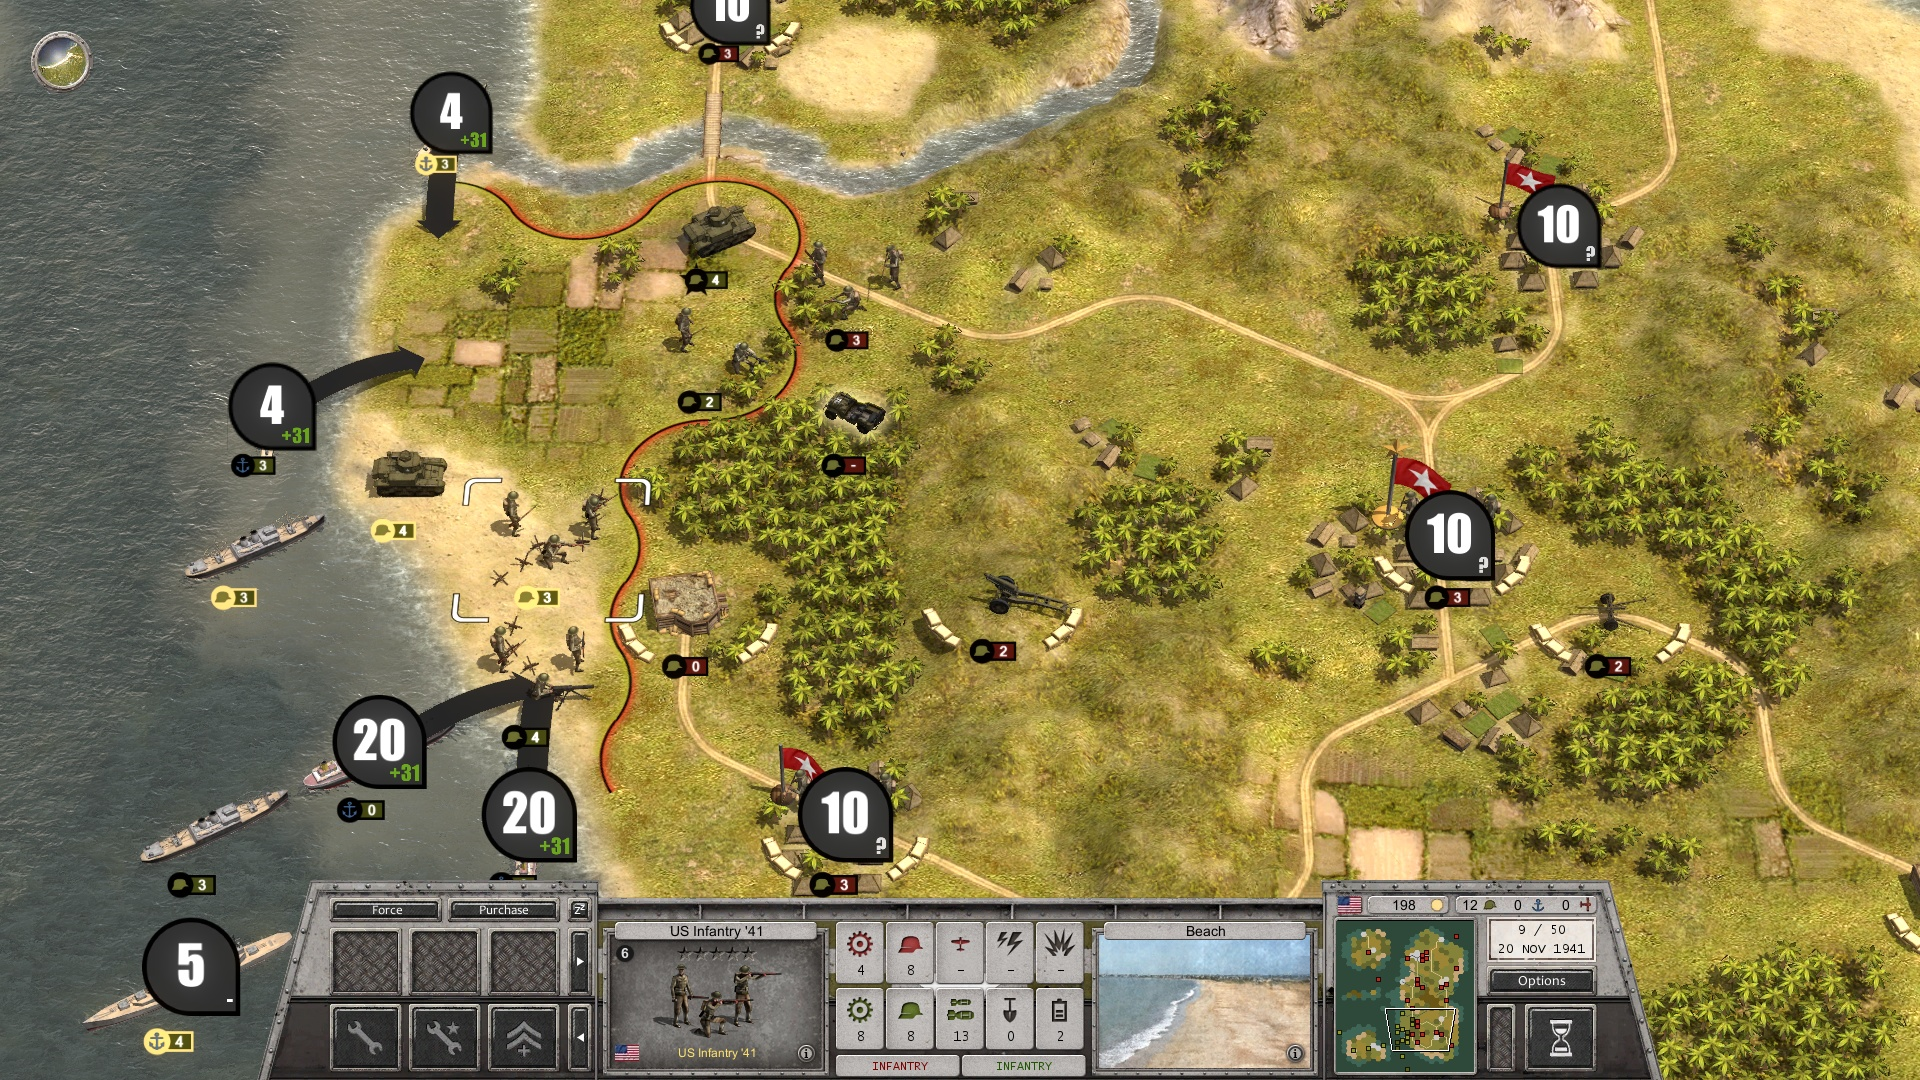 Free mac world war 2 games best casino game pc 2013